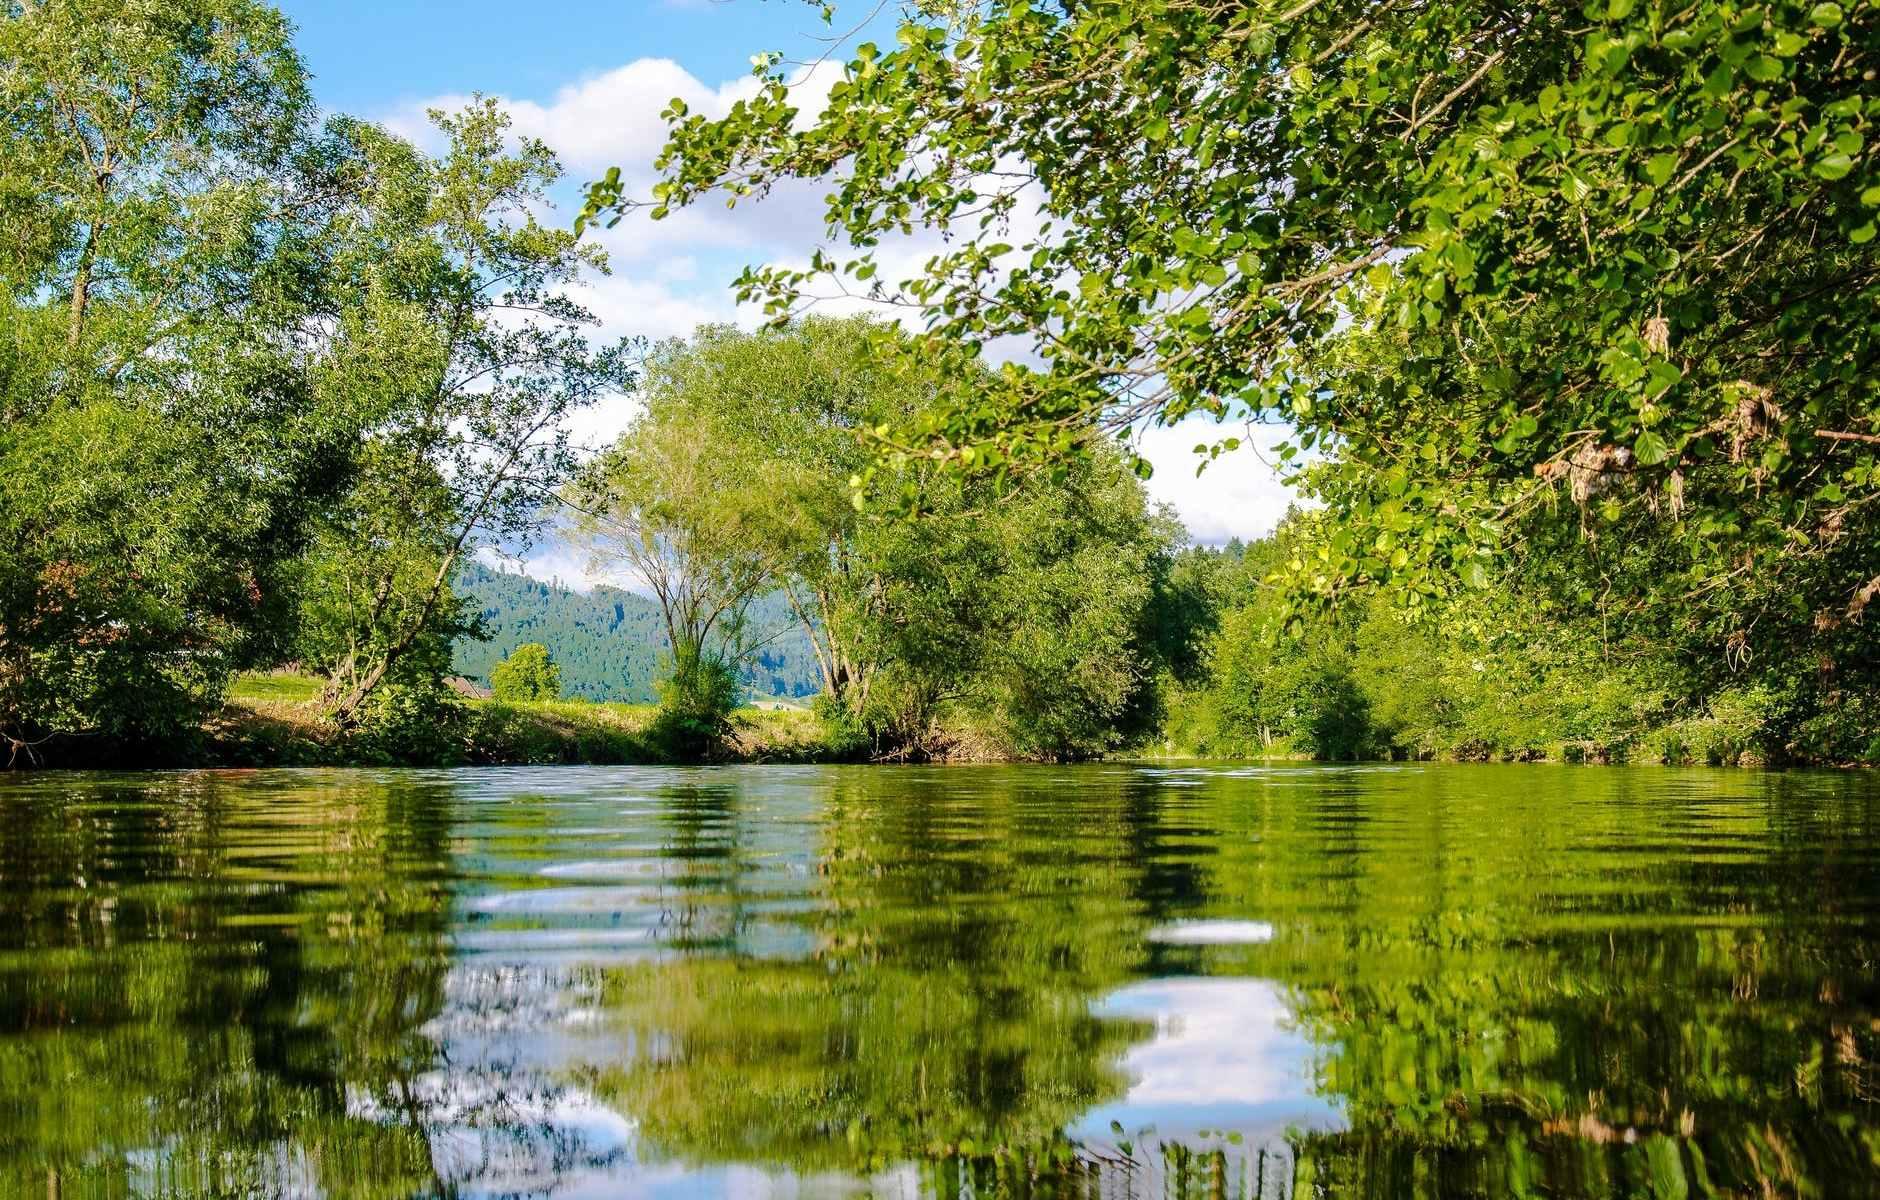 panoramic photo of bushes near pond